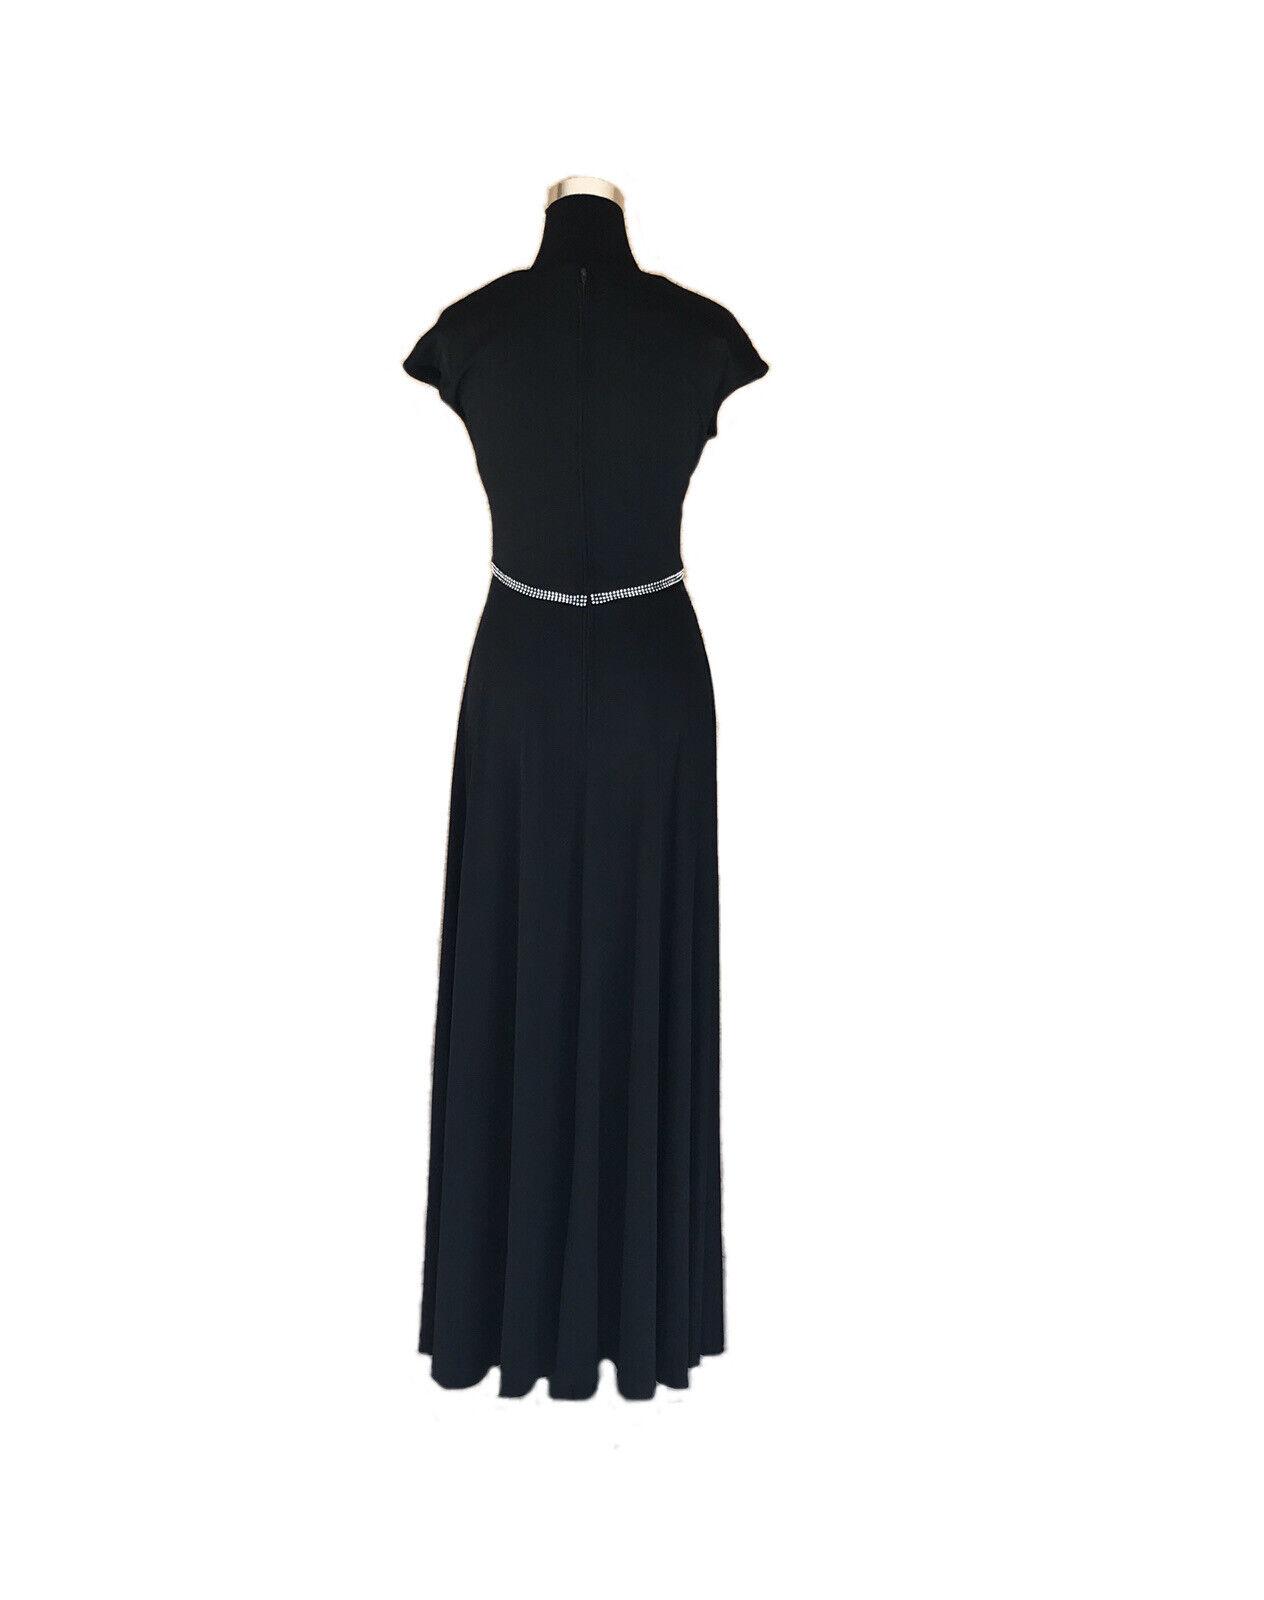 Vintage Luis Estevez Dress Eva Gabor Look Label B… - image 5